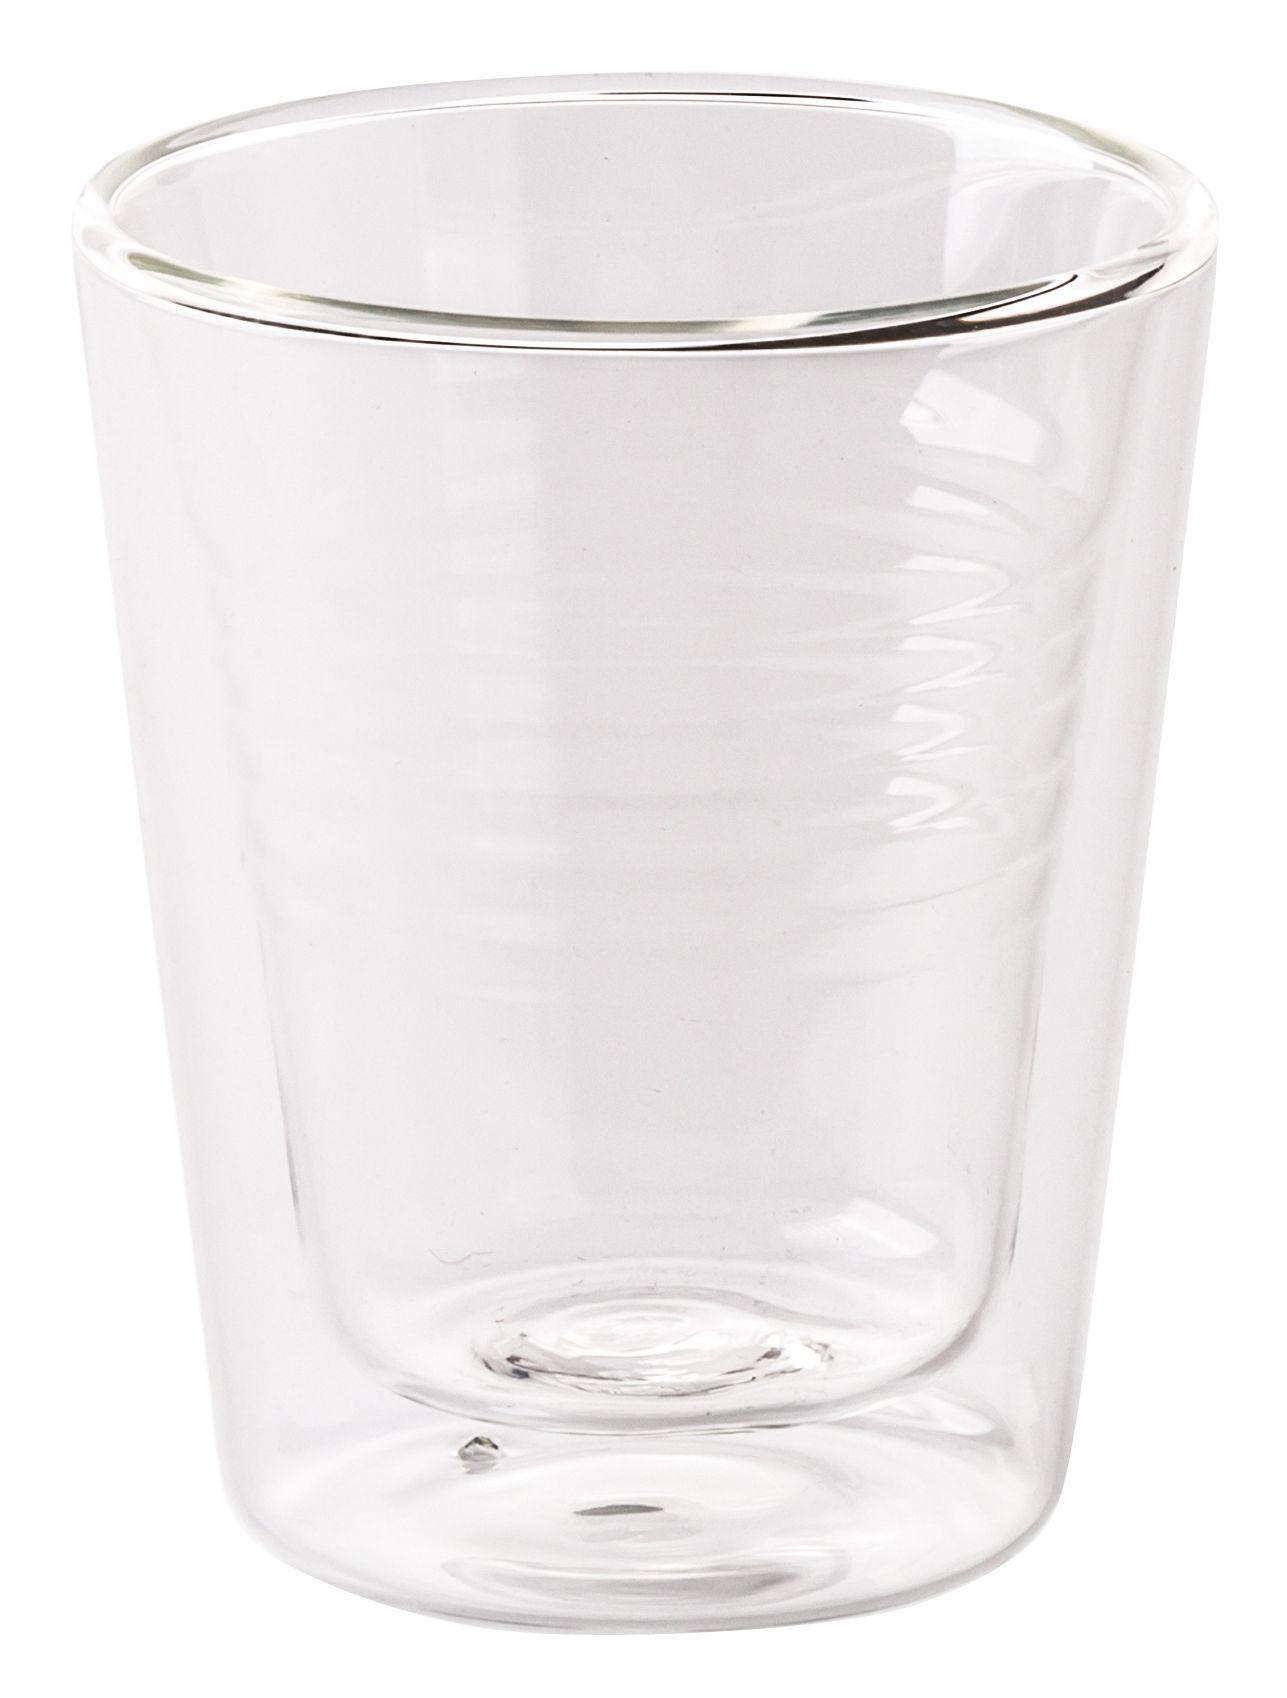 Tischkultur - Tassen und Becher - Estetico Quotidiano Thermobecher / Glas - Seletti - Transparent - Borosilikatglas